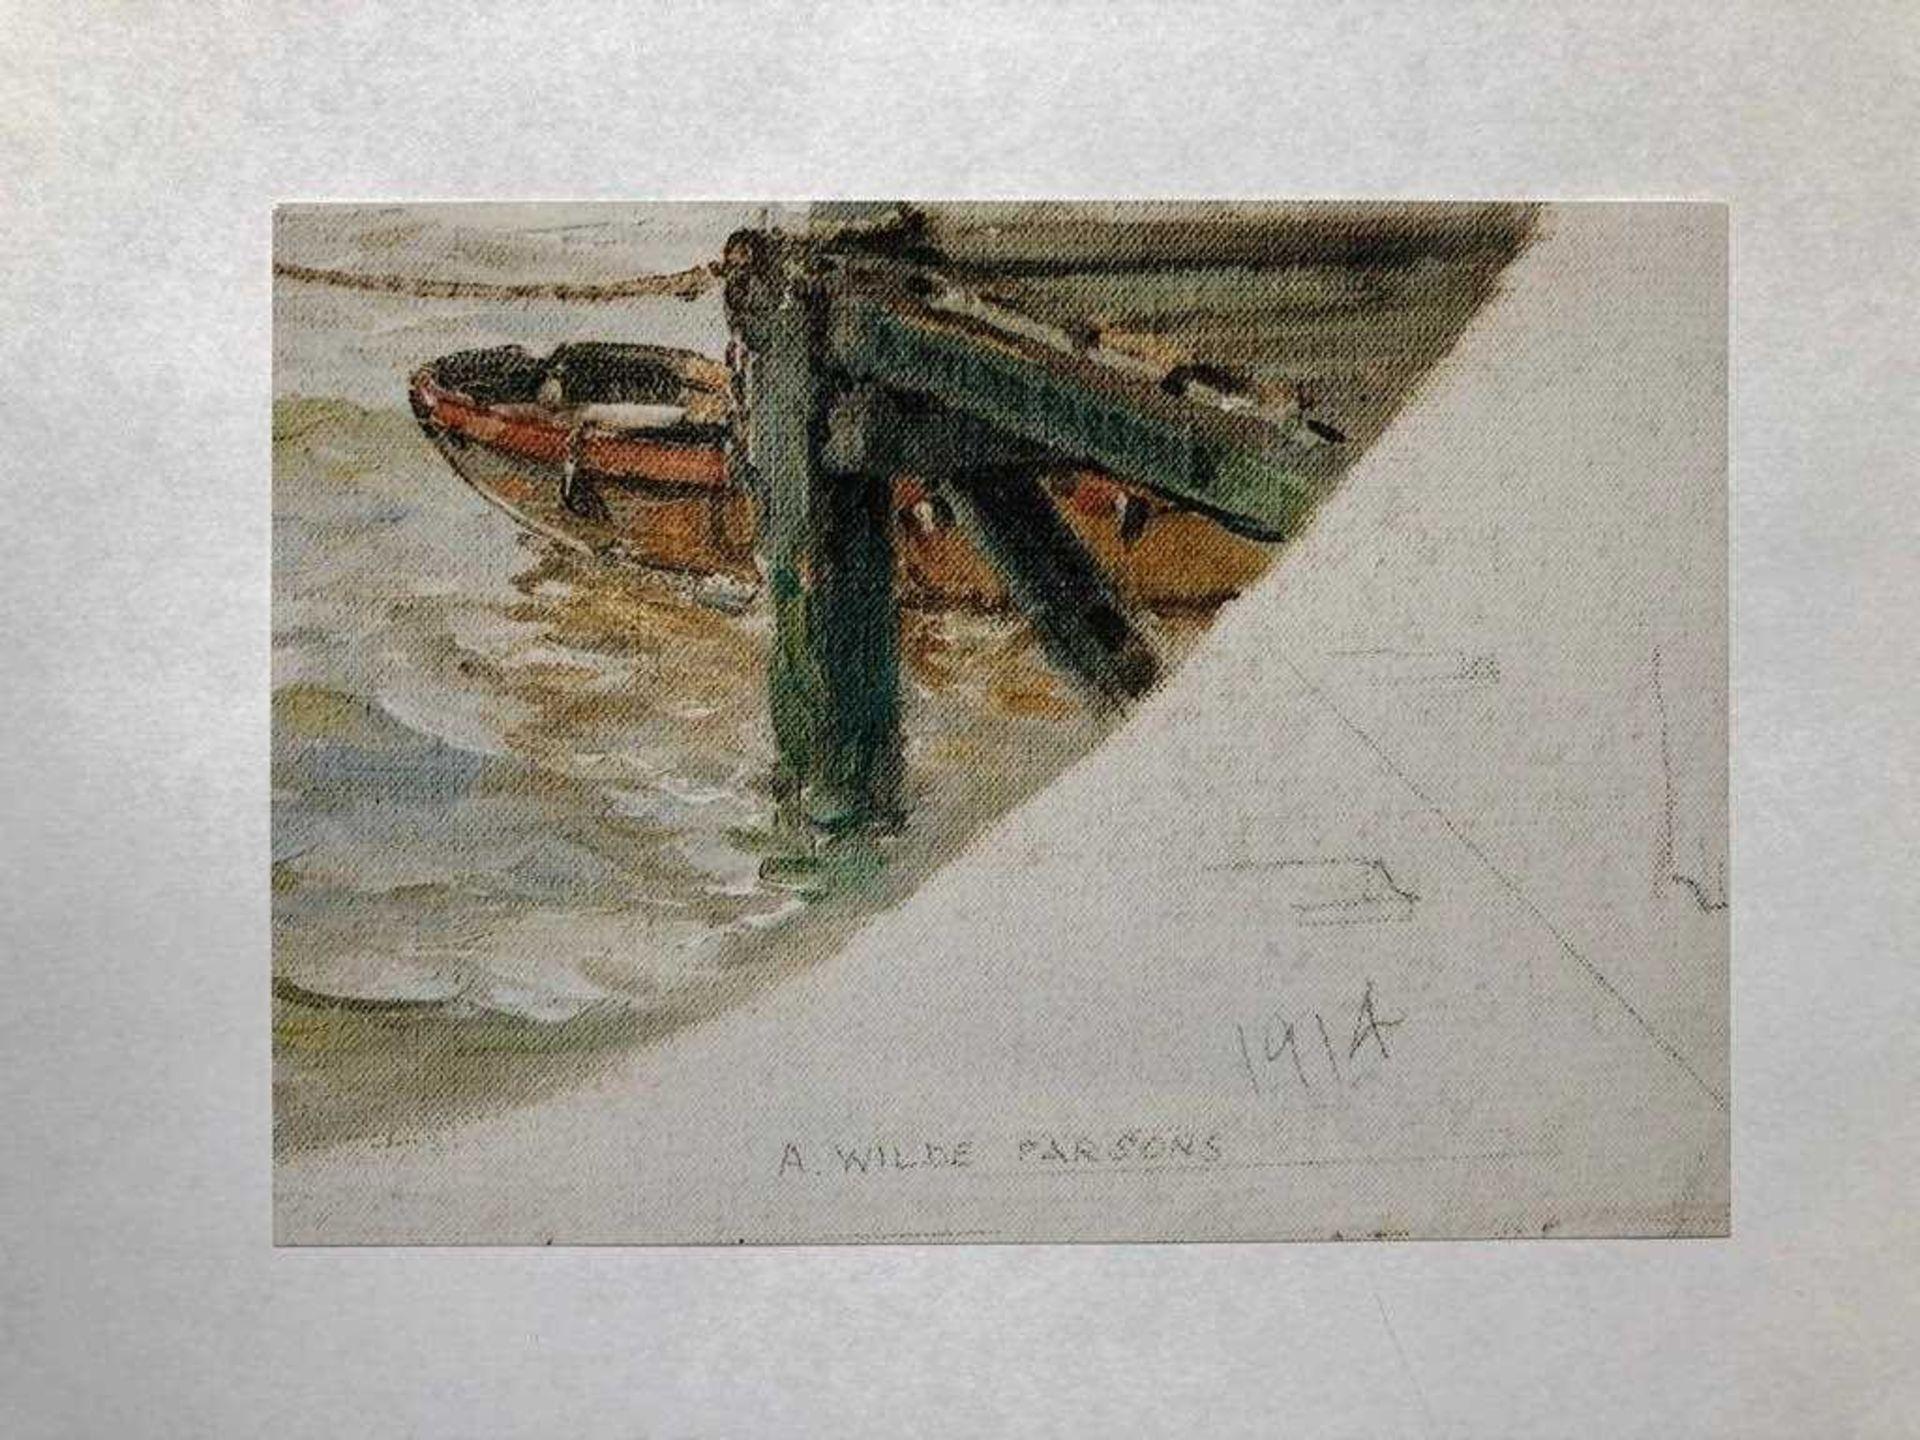 ARTHUR WILDE PARSONS (1854-1931) - Image 3 of 3